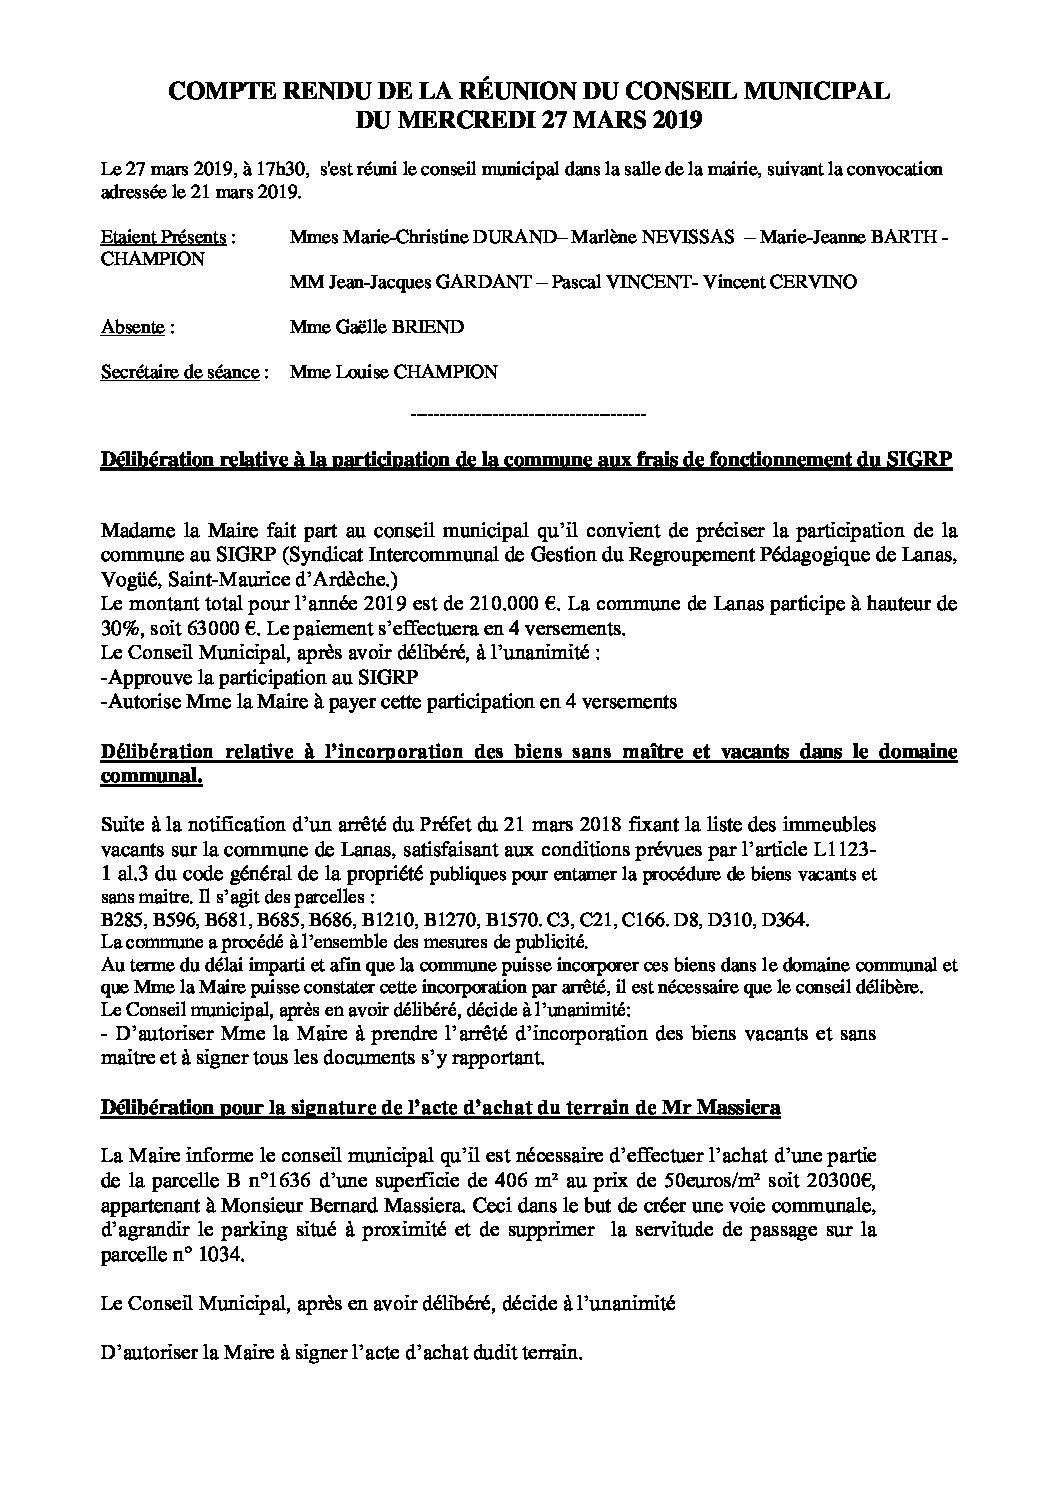 conseil municipal du 27.03.2019